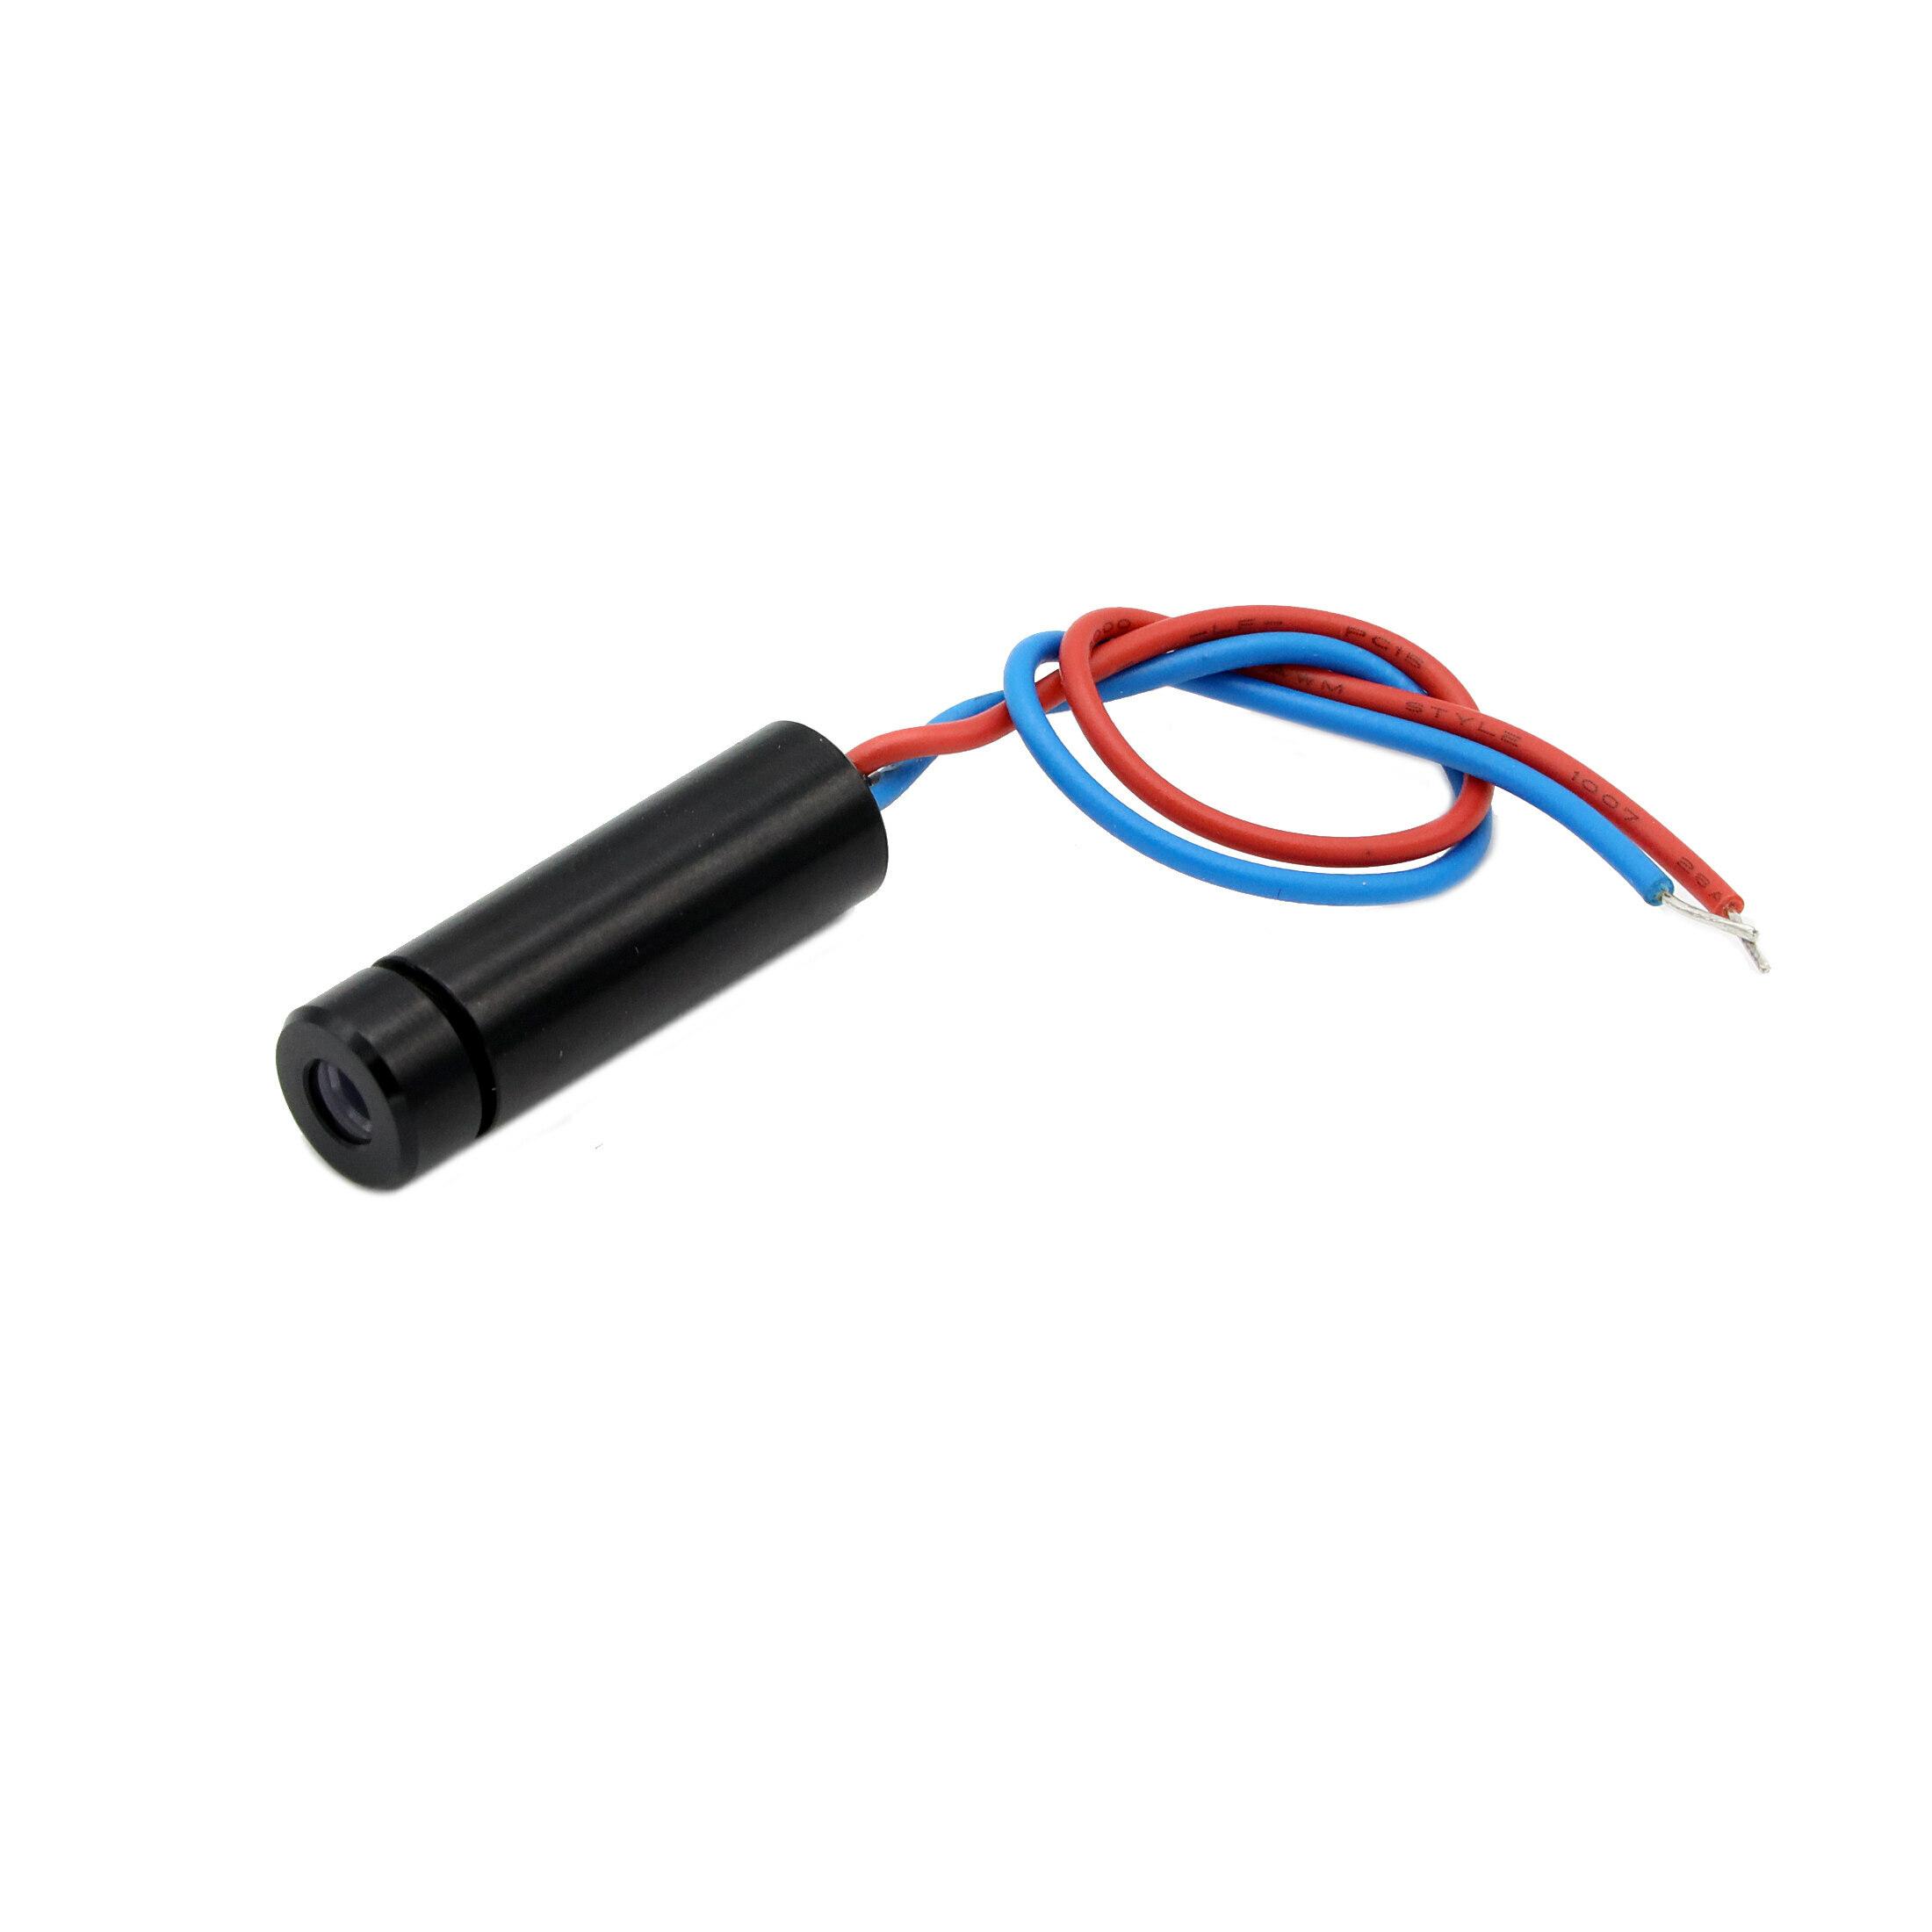 Picotronic Laser DC650-0.4-3(8x25)